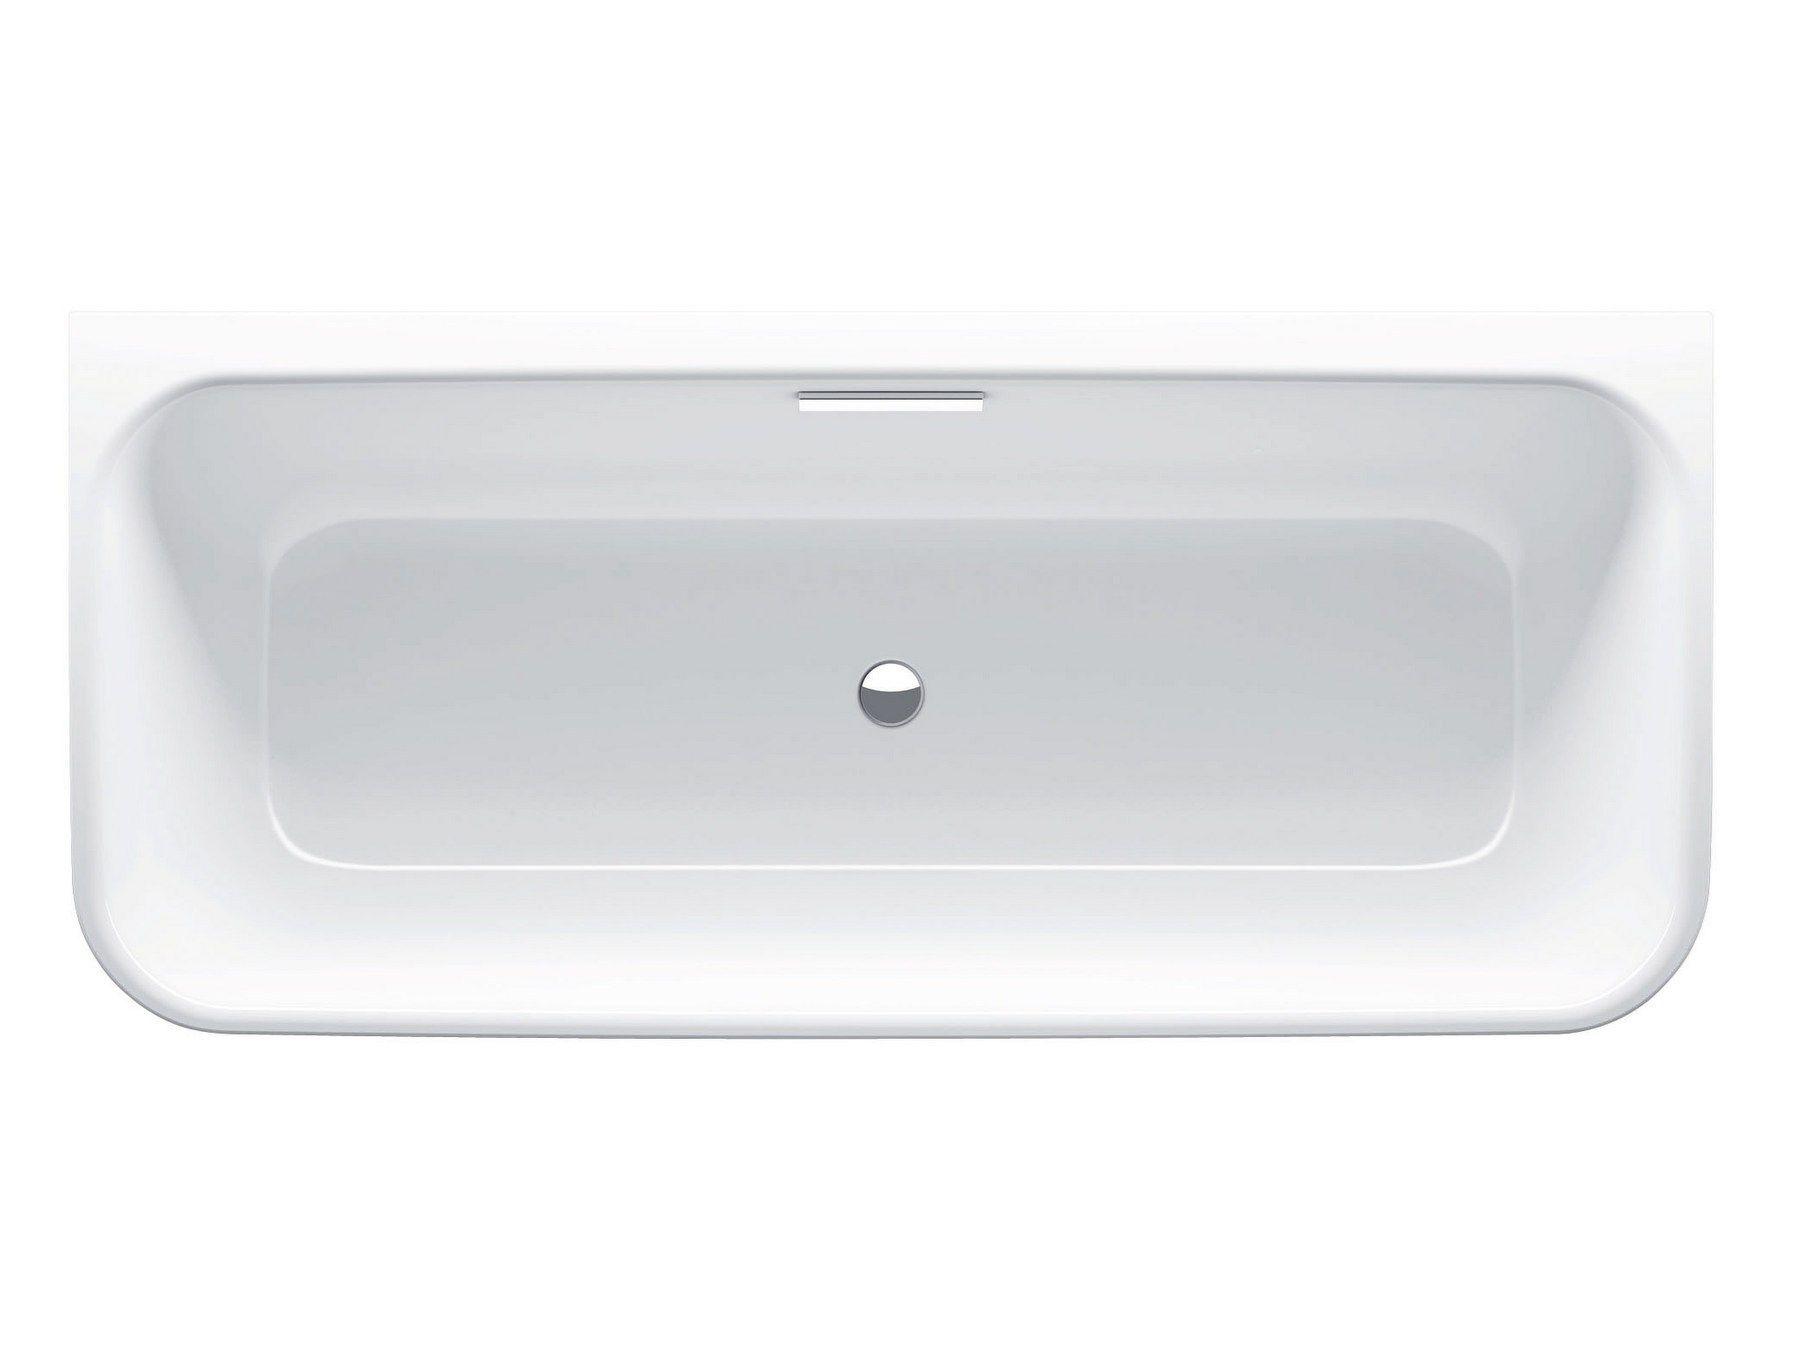 Vasca da bagno in acciaio smaltato betteart i by bette design tesseraux partner - Vasche da bagno in acciaio smaltato ...